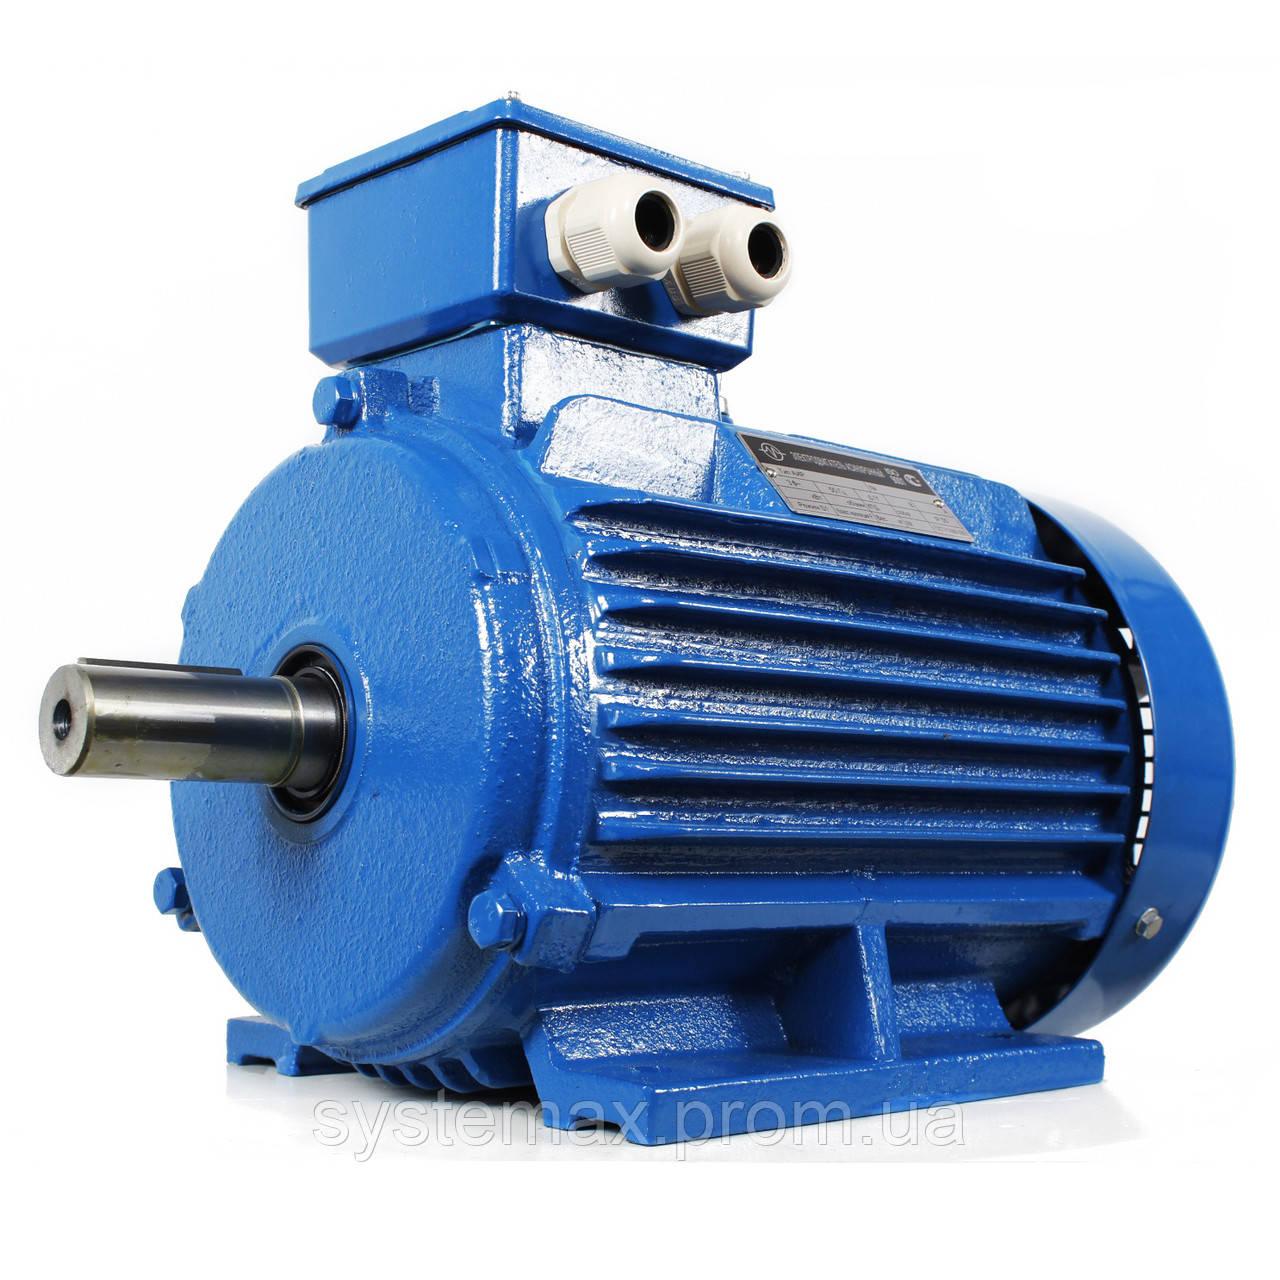 Электродвигатель АИР355MLA8 (АИР 355 MLA8) 200 кВт 750 об/мин